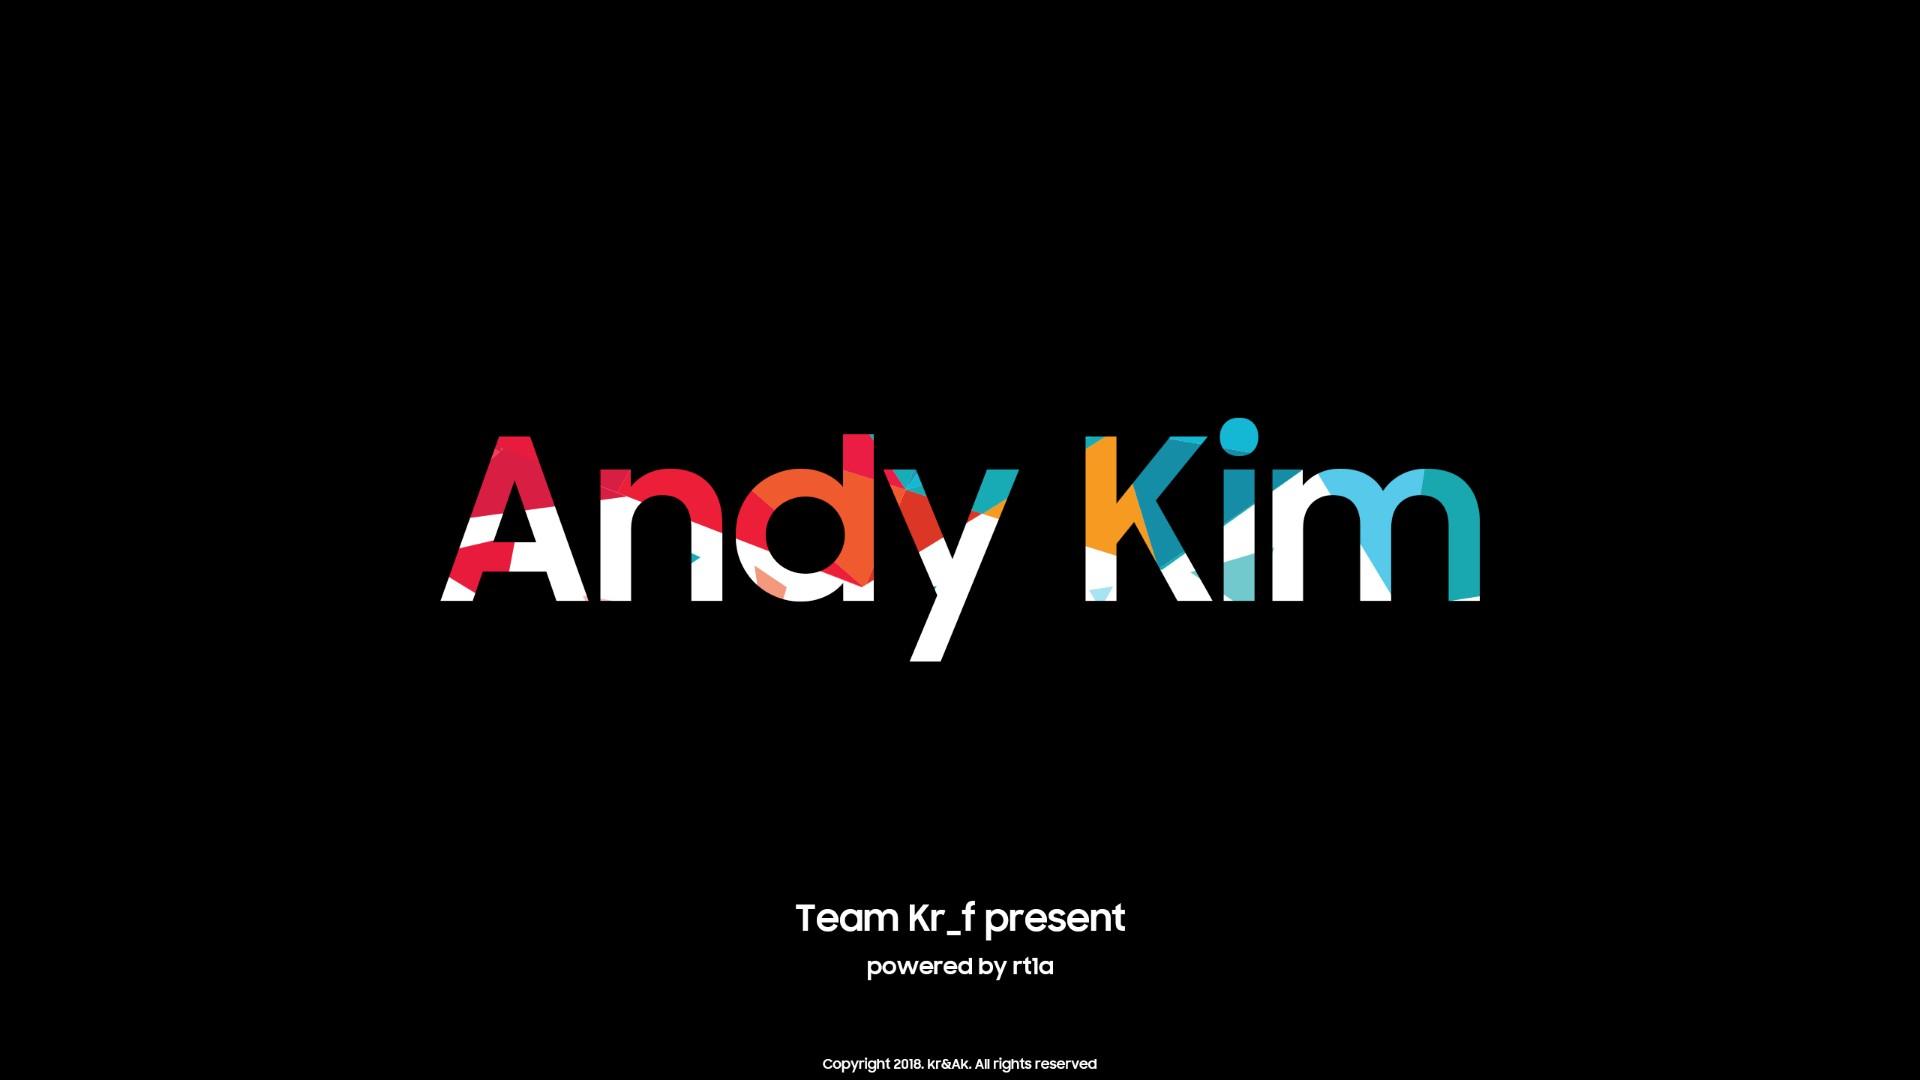 AndyKim